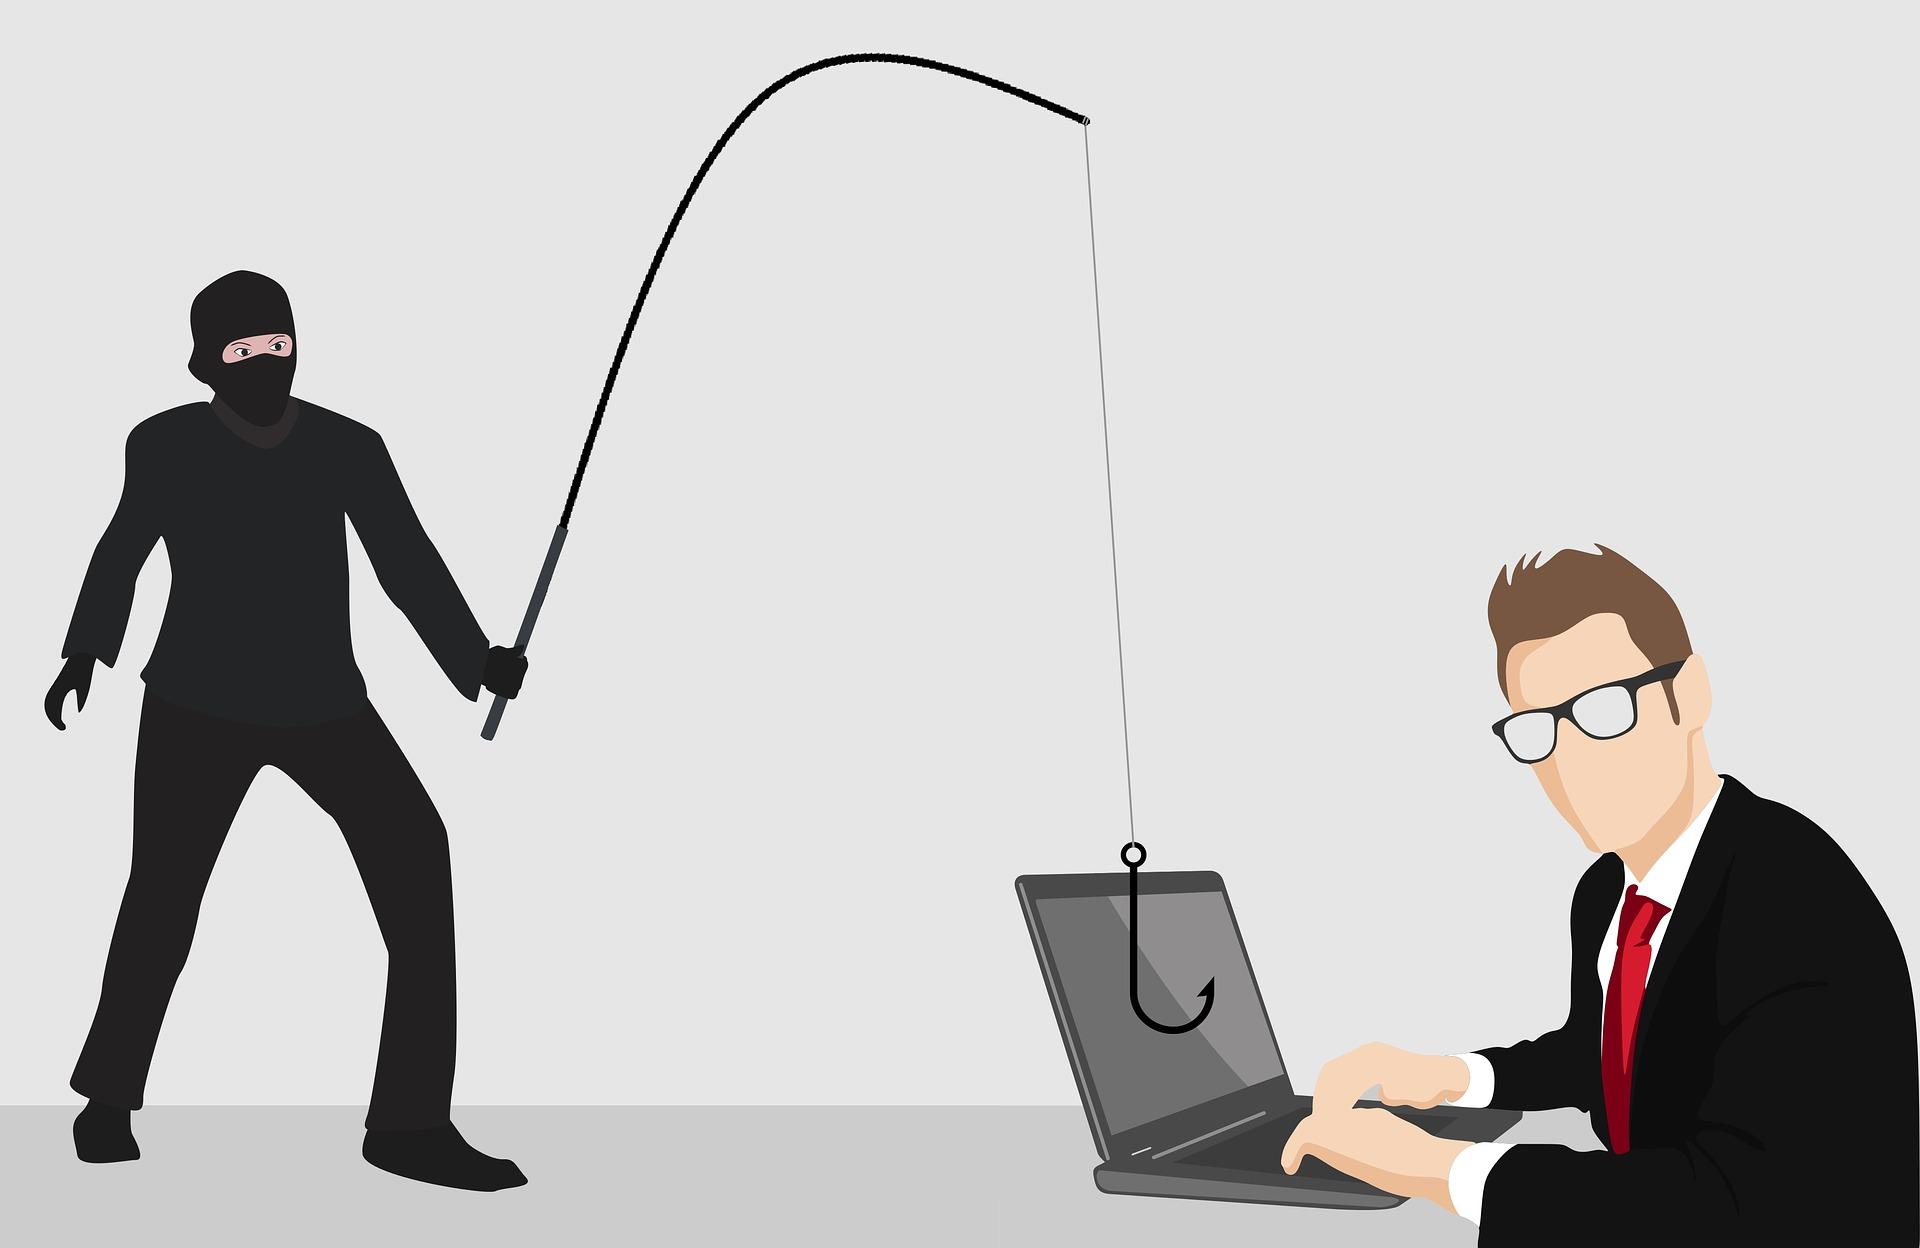 Wells Fargo Account Security Notification Phishing Scams